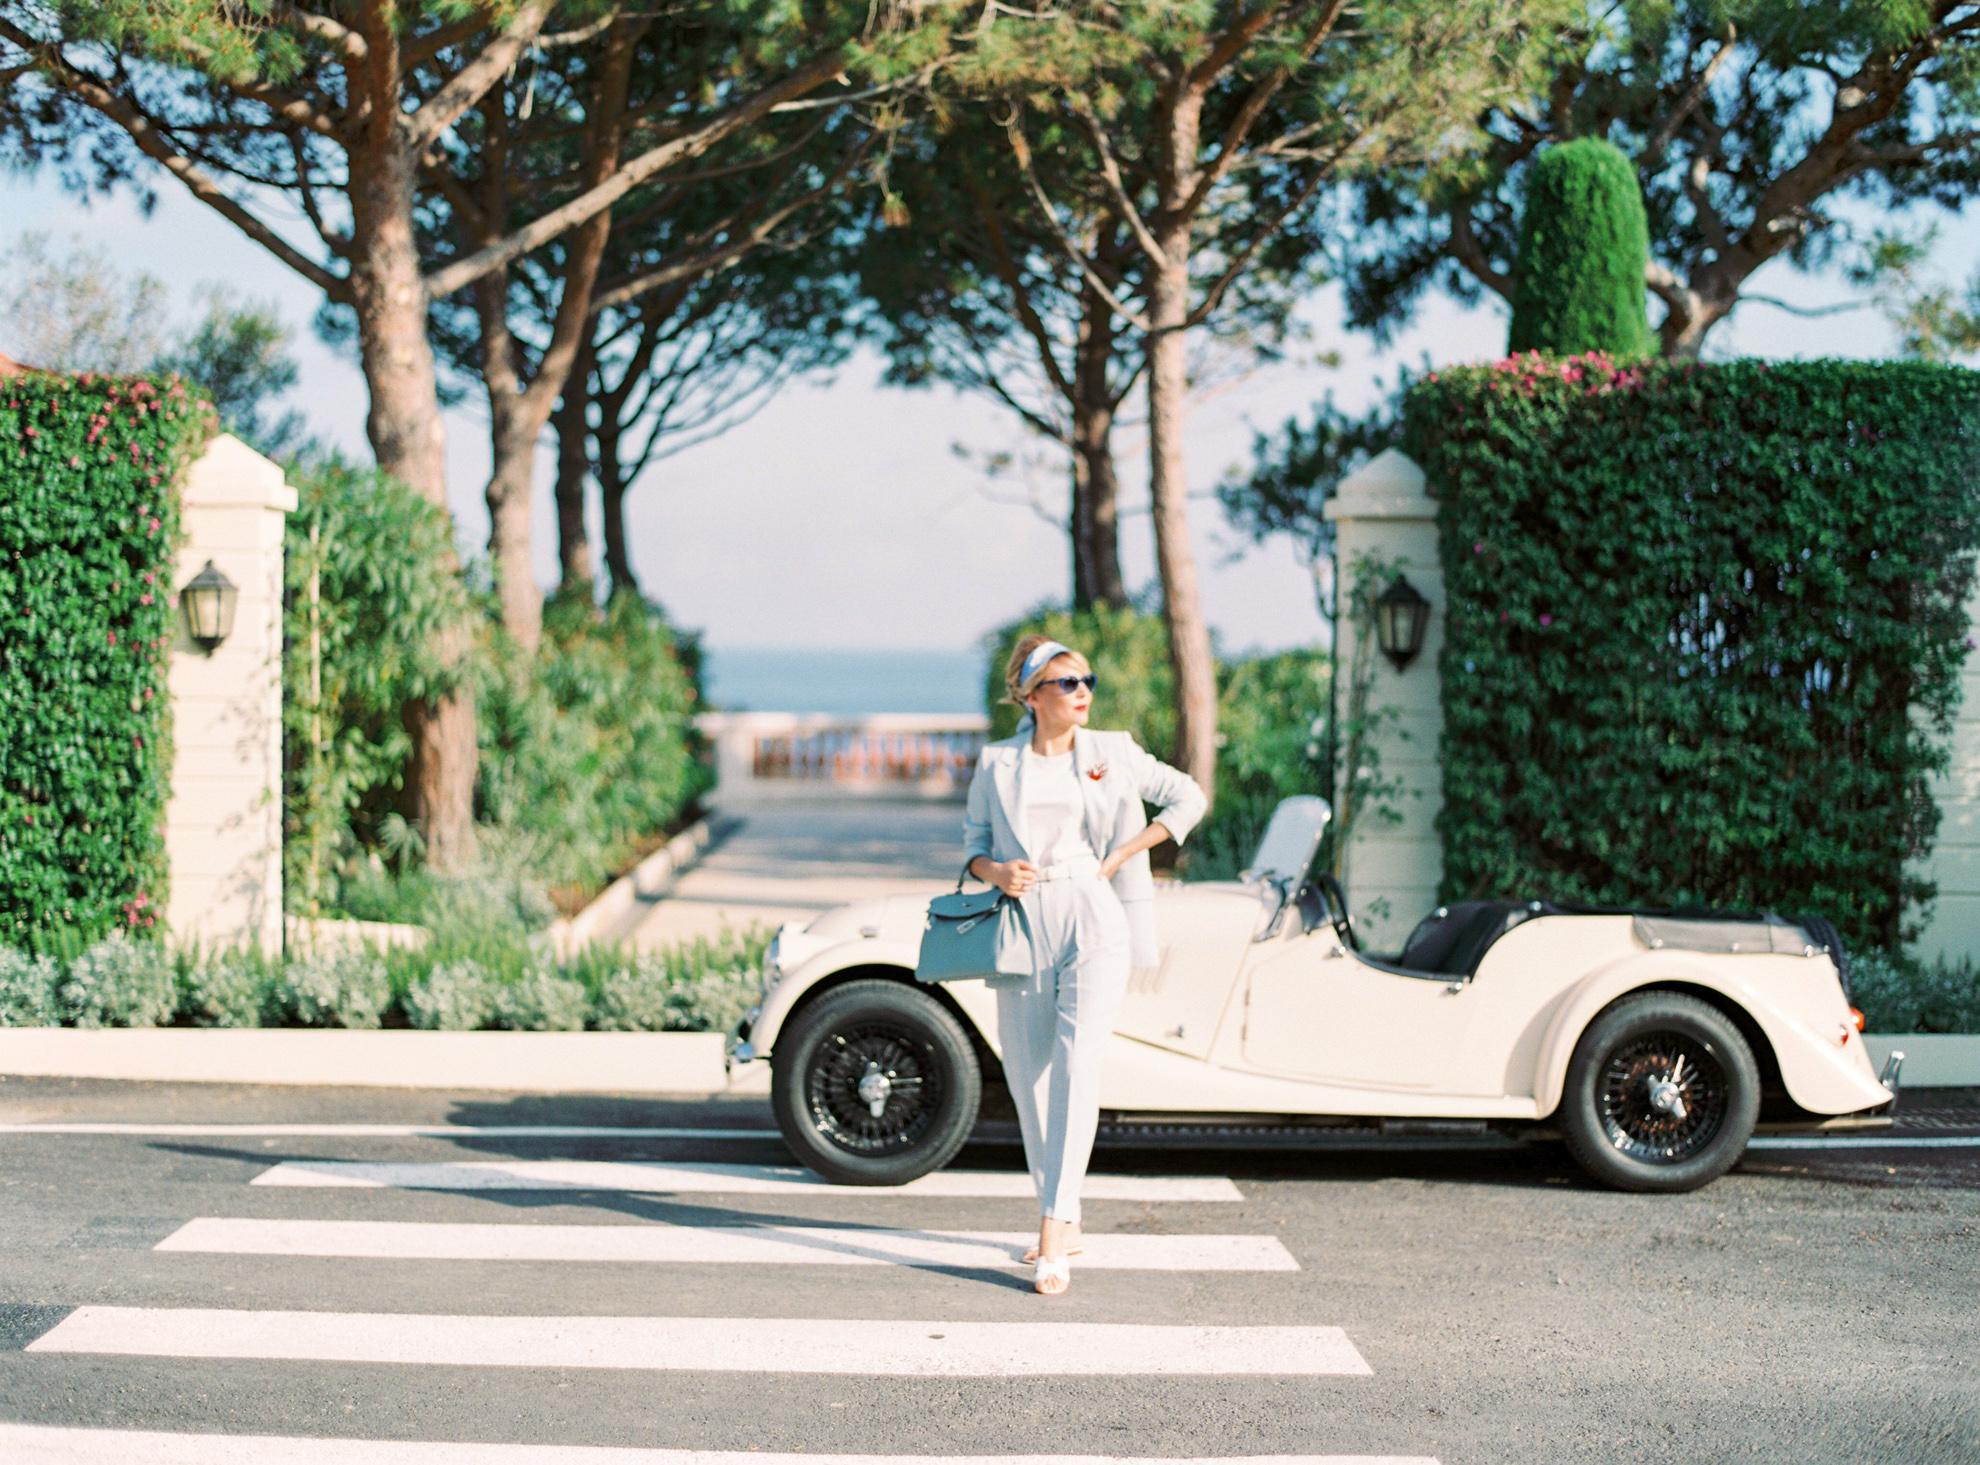 074 Grand Hotel du Cap Ferrat Fine Art Engagement Photography Session by Tony Gigov